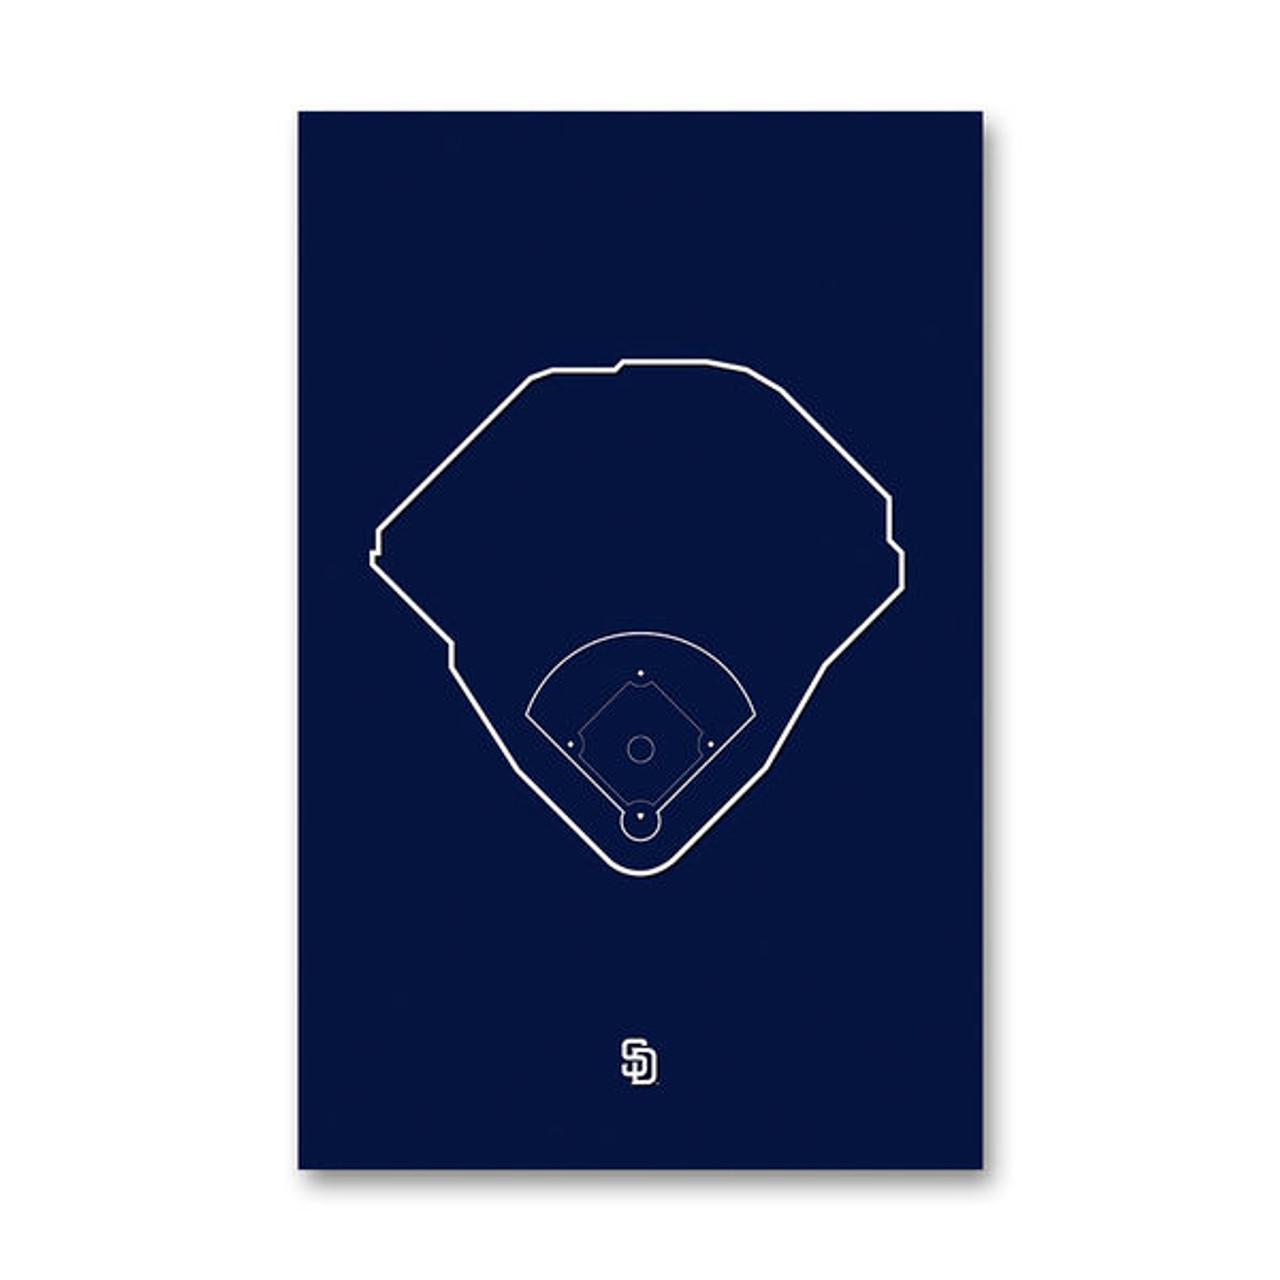 Petco Park Outline - San Diego Padres Art Poster